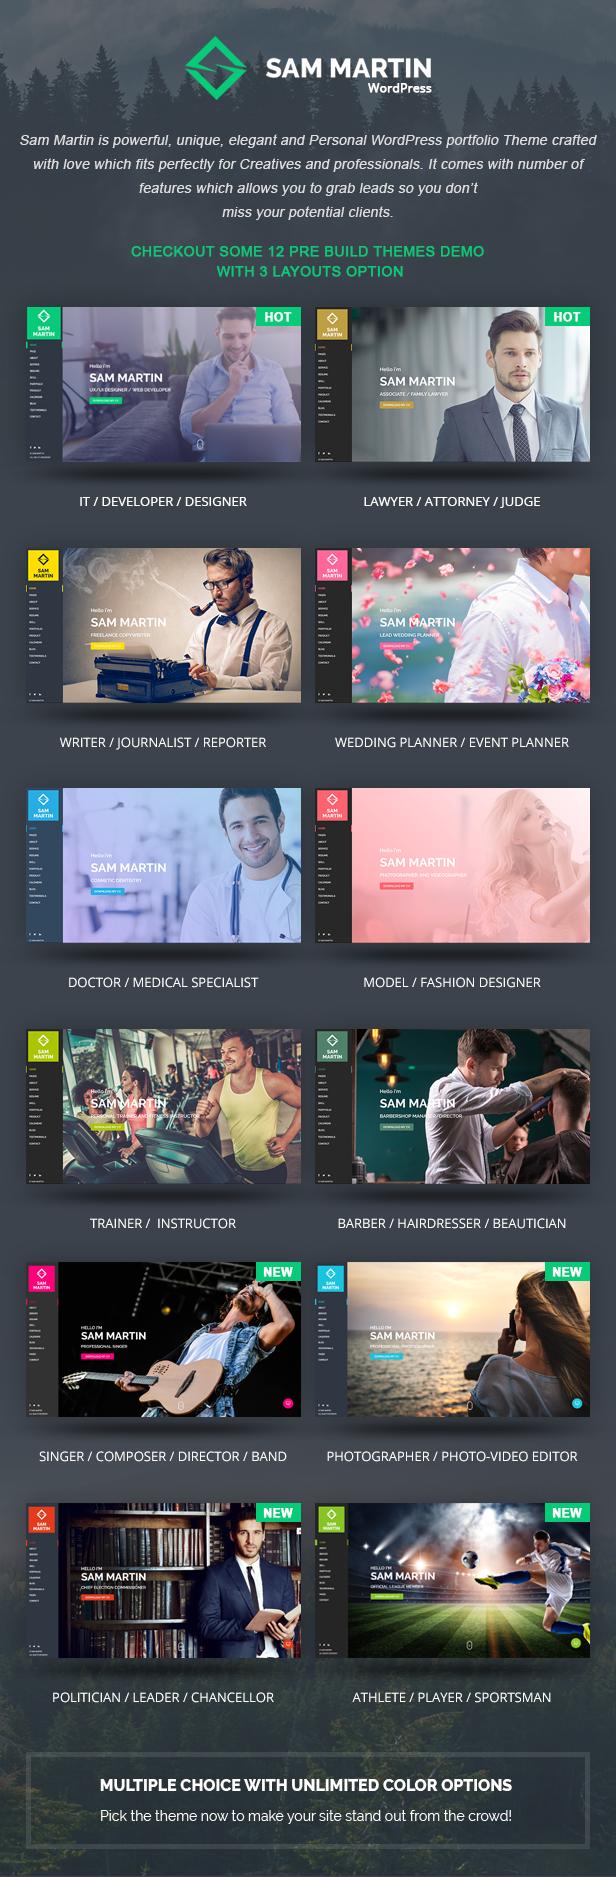 Sam Martin - Personal vCard Resume WordPress Theme - 5